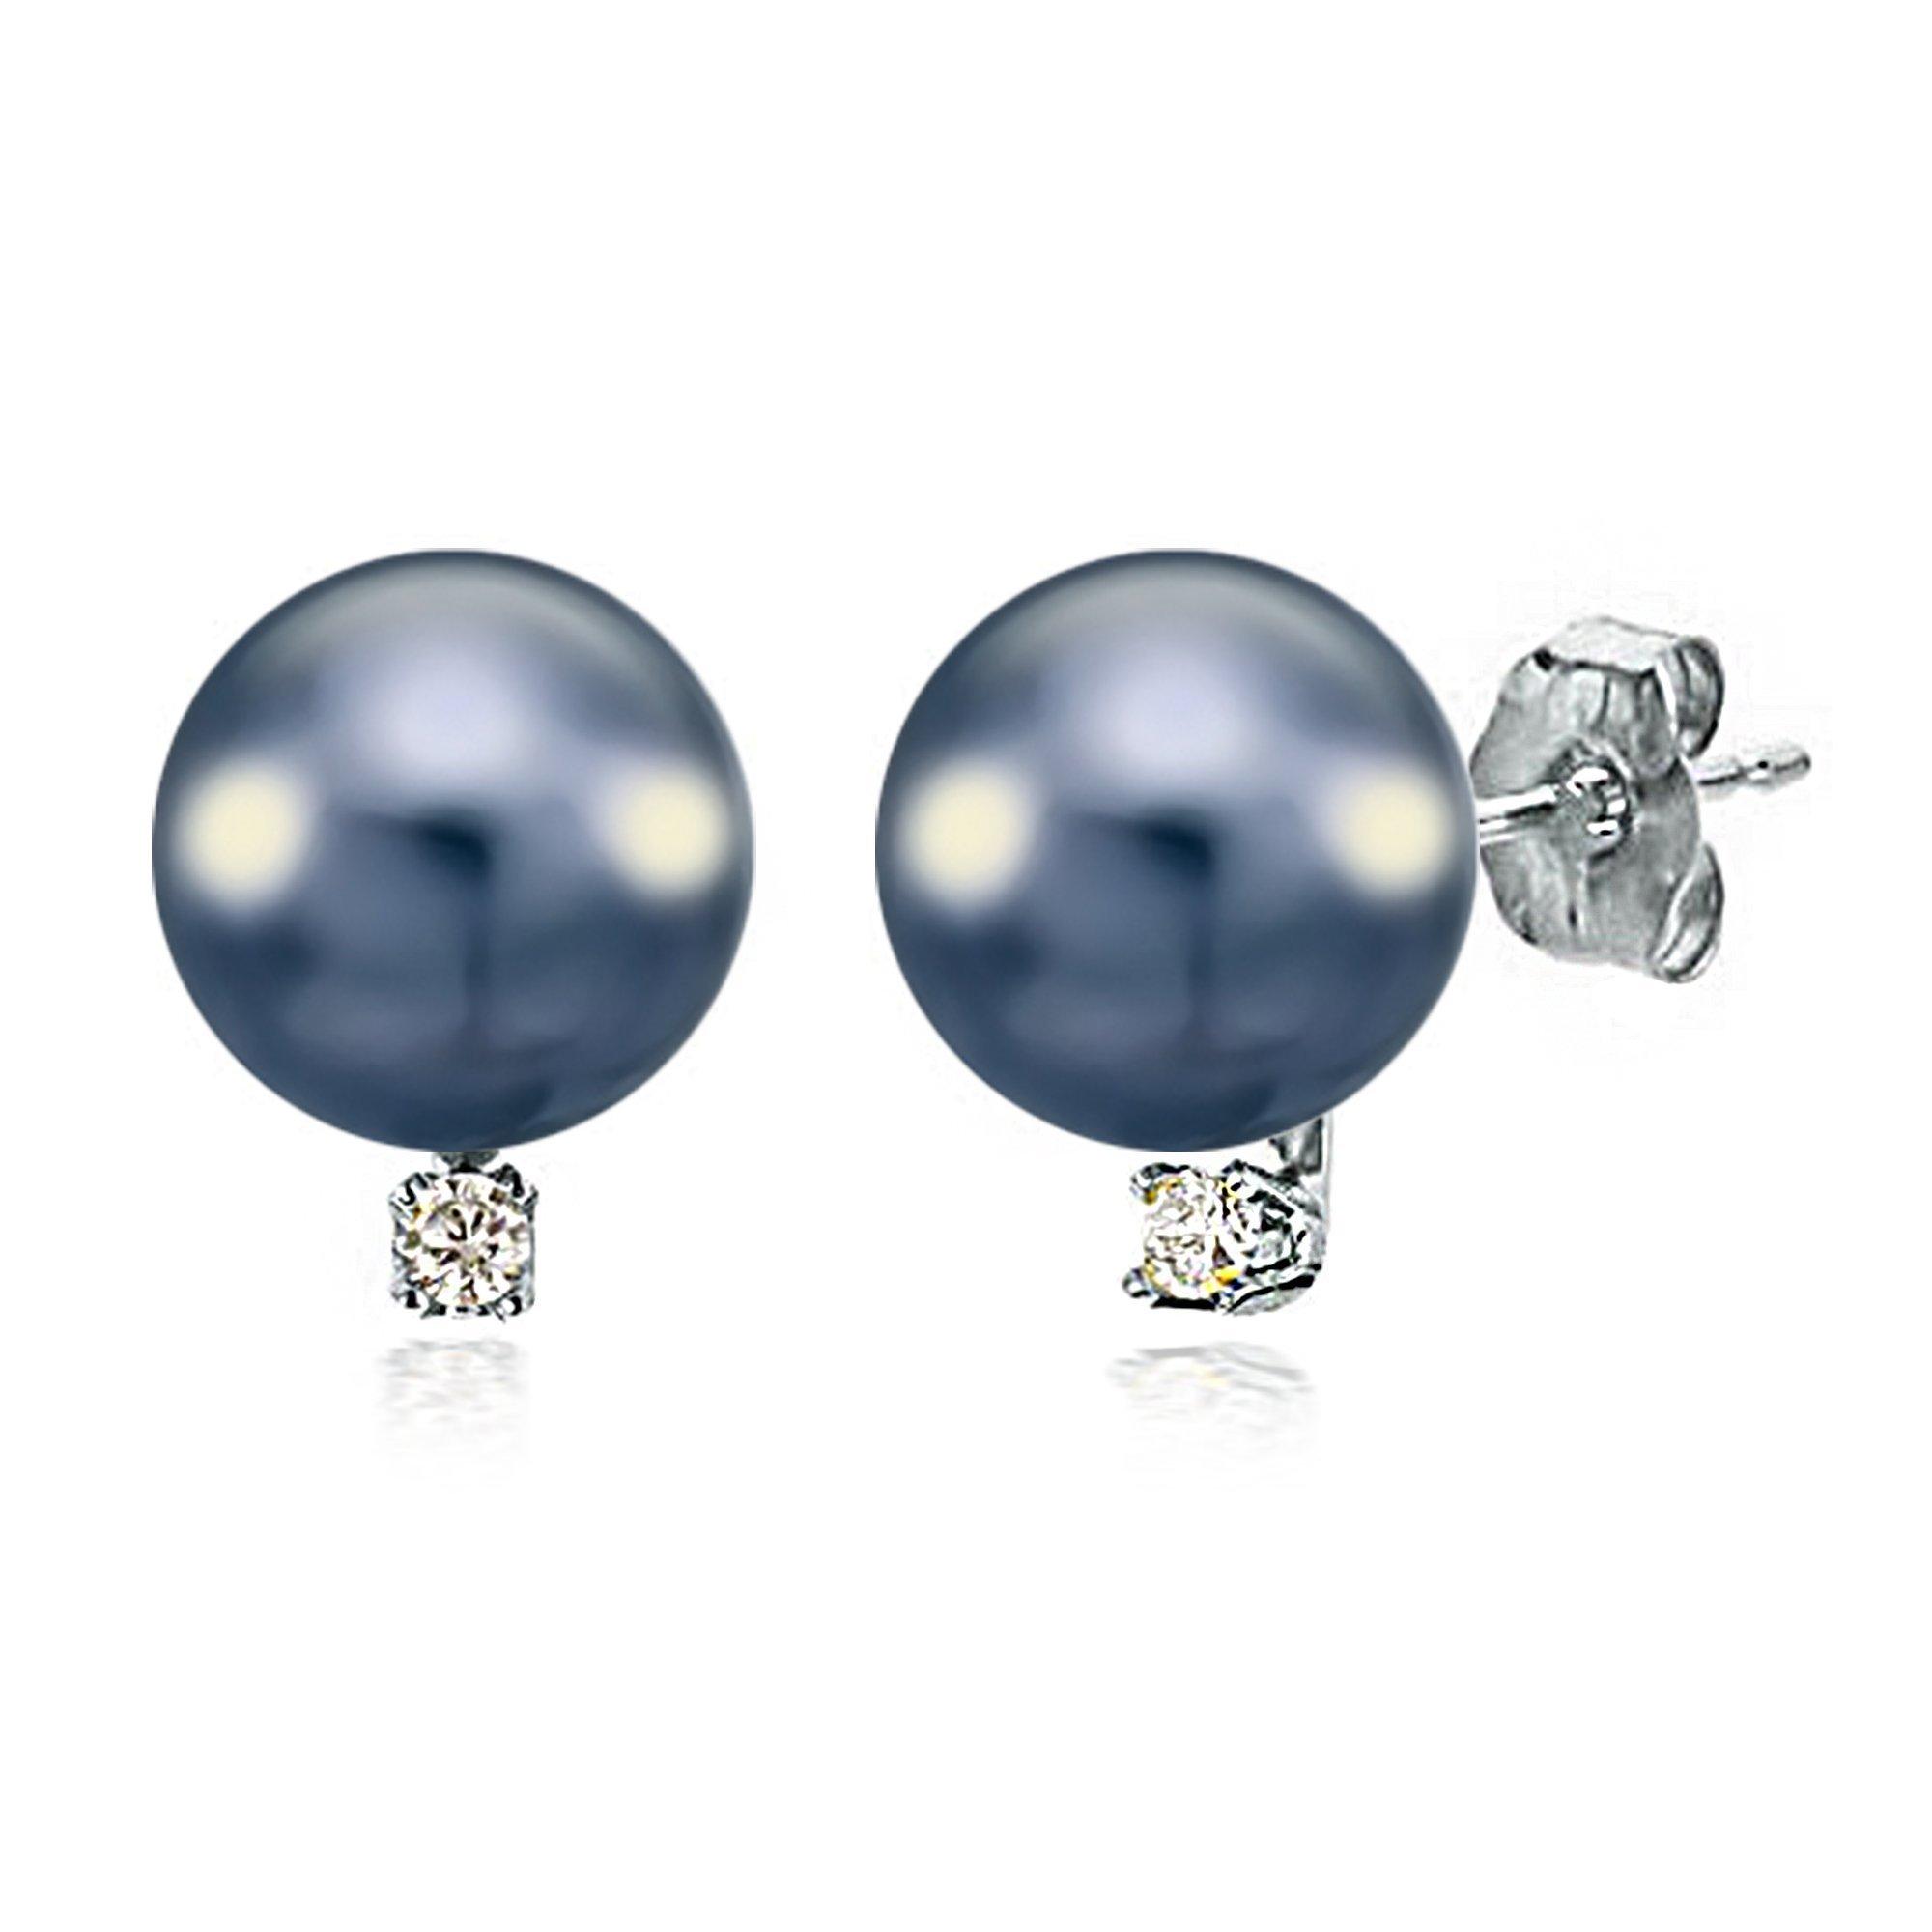 14K White Gold Studs Black Cultured Freshwater Pearl Earrings Diamond Birthday Gift 1/50 CTTW 8-8.5